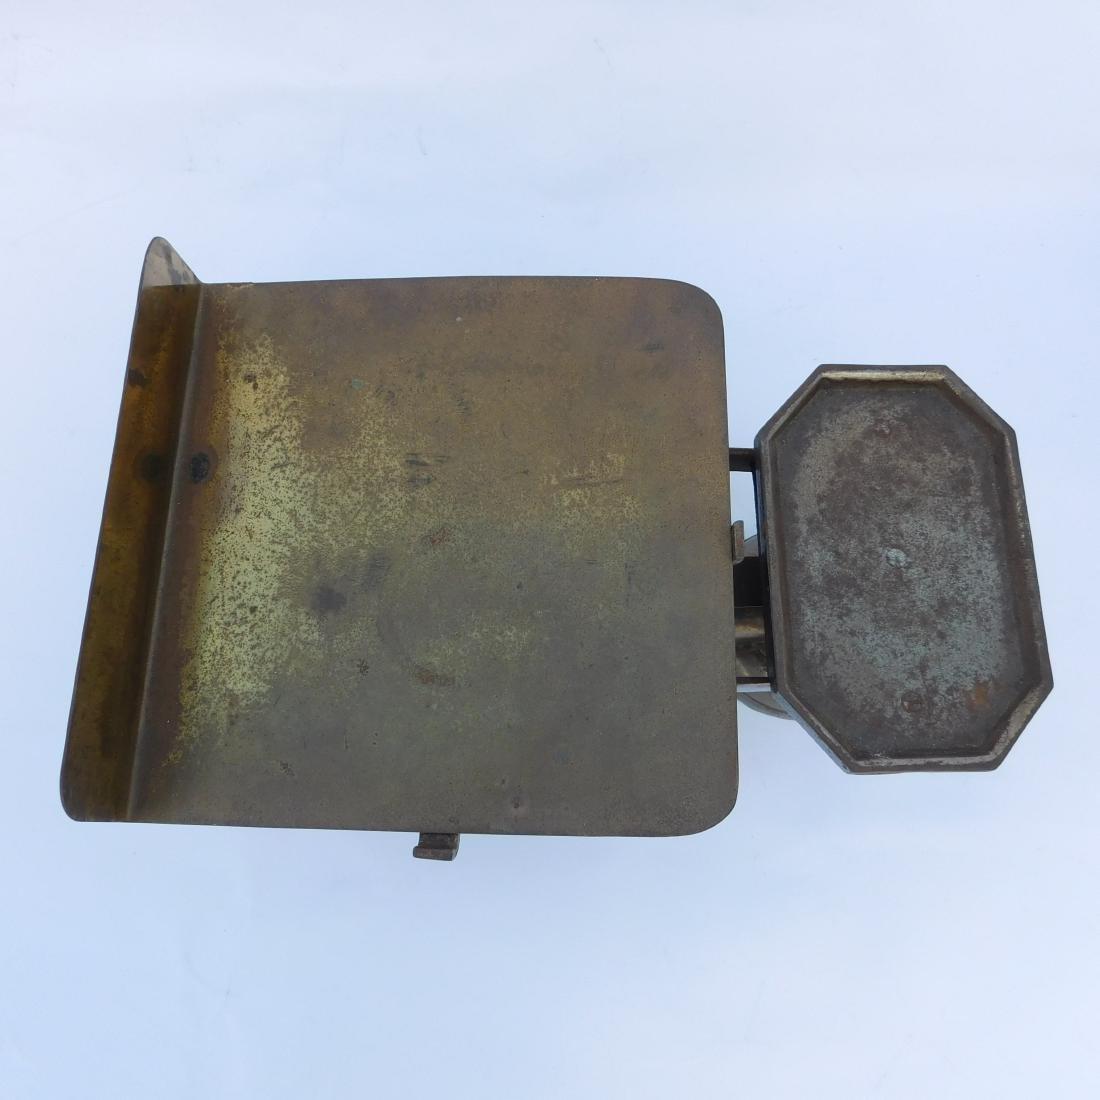 Vintage Scale - 2